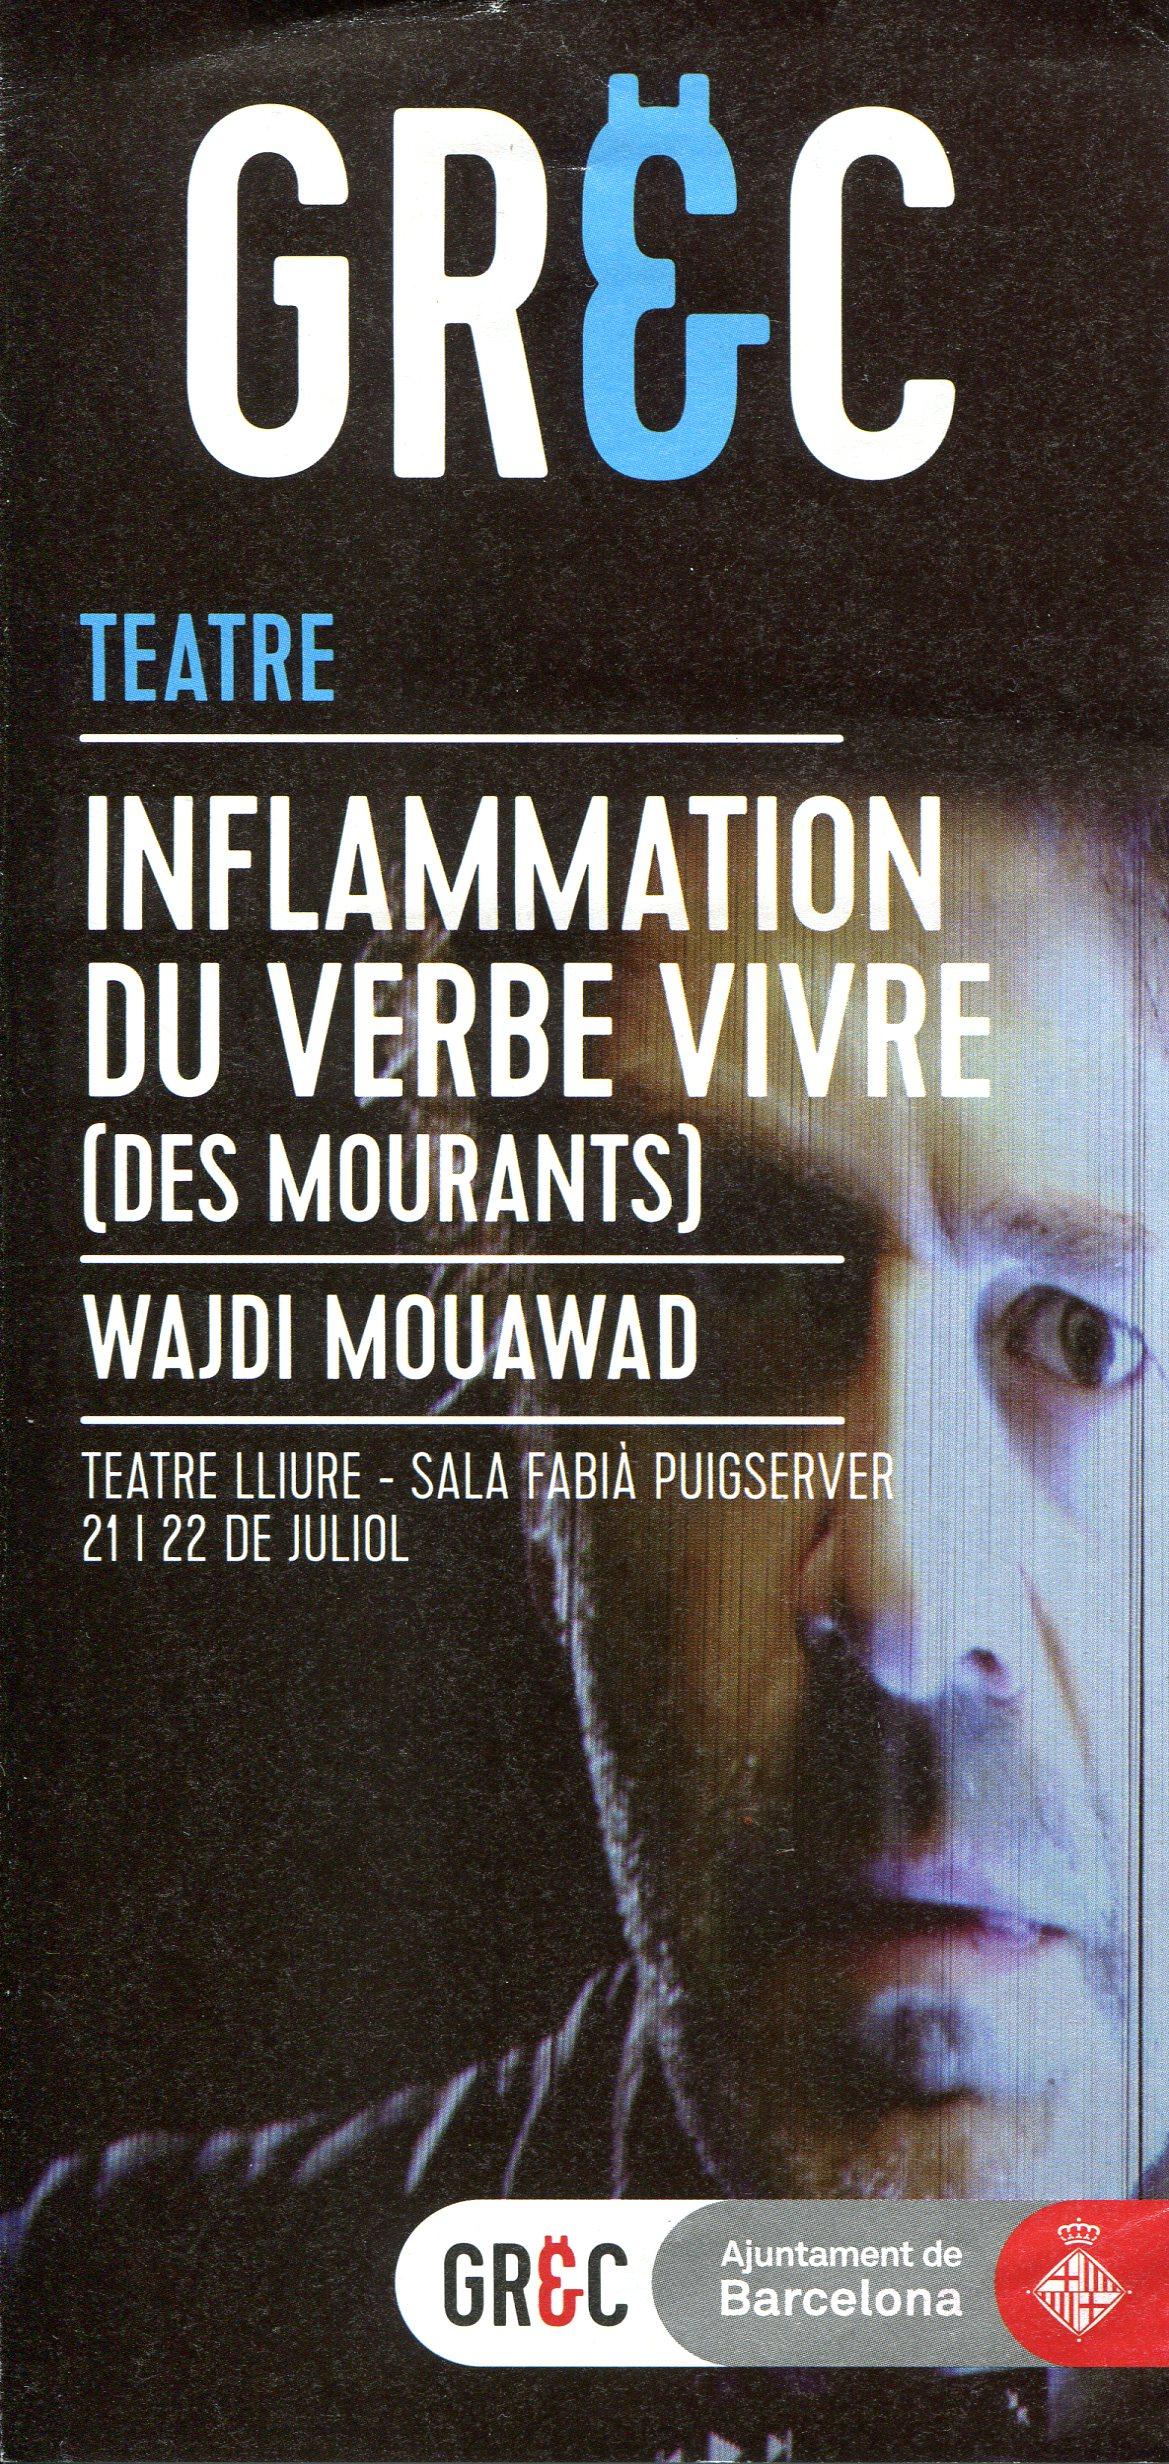 2017 07 21 Wajdi Mouawad Des Mourants 01.jpg